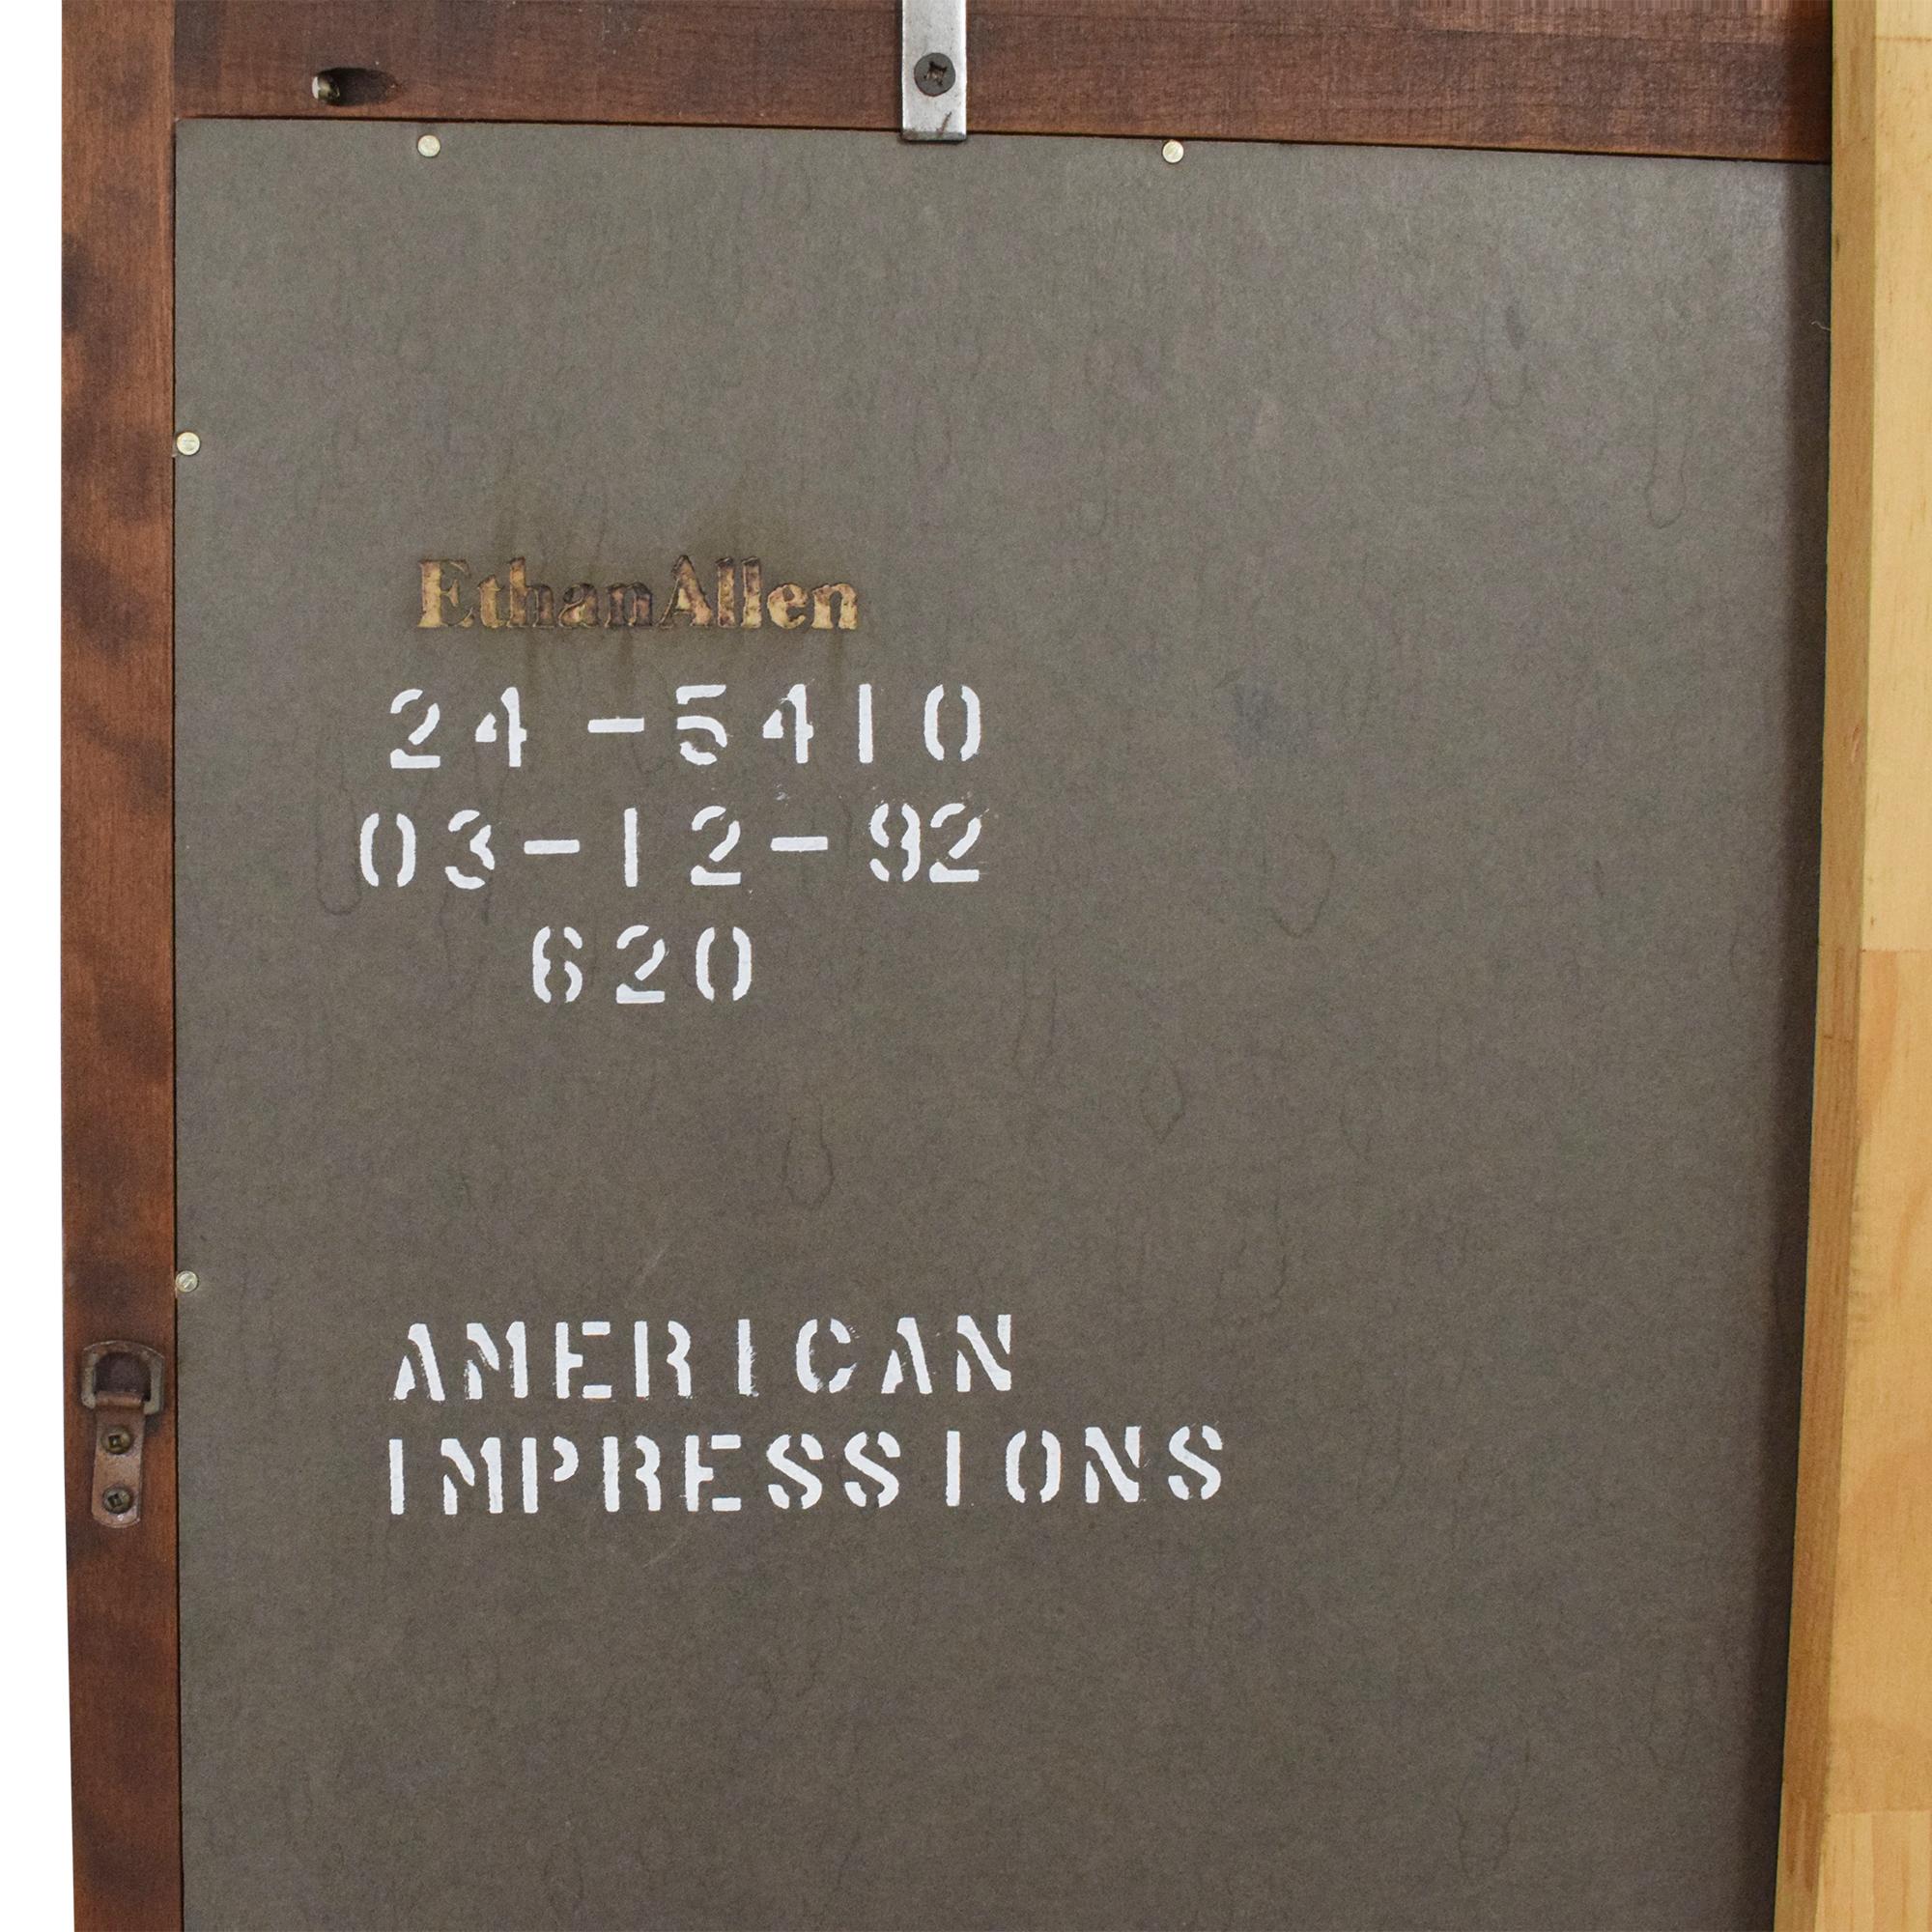 Ethan Allen Ethan Allen American Impressions Arched Mirror nj